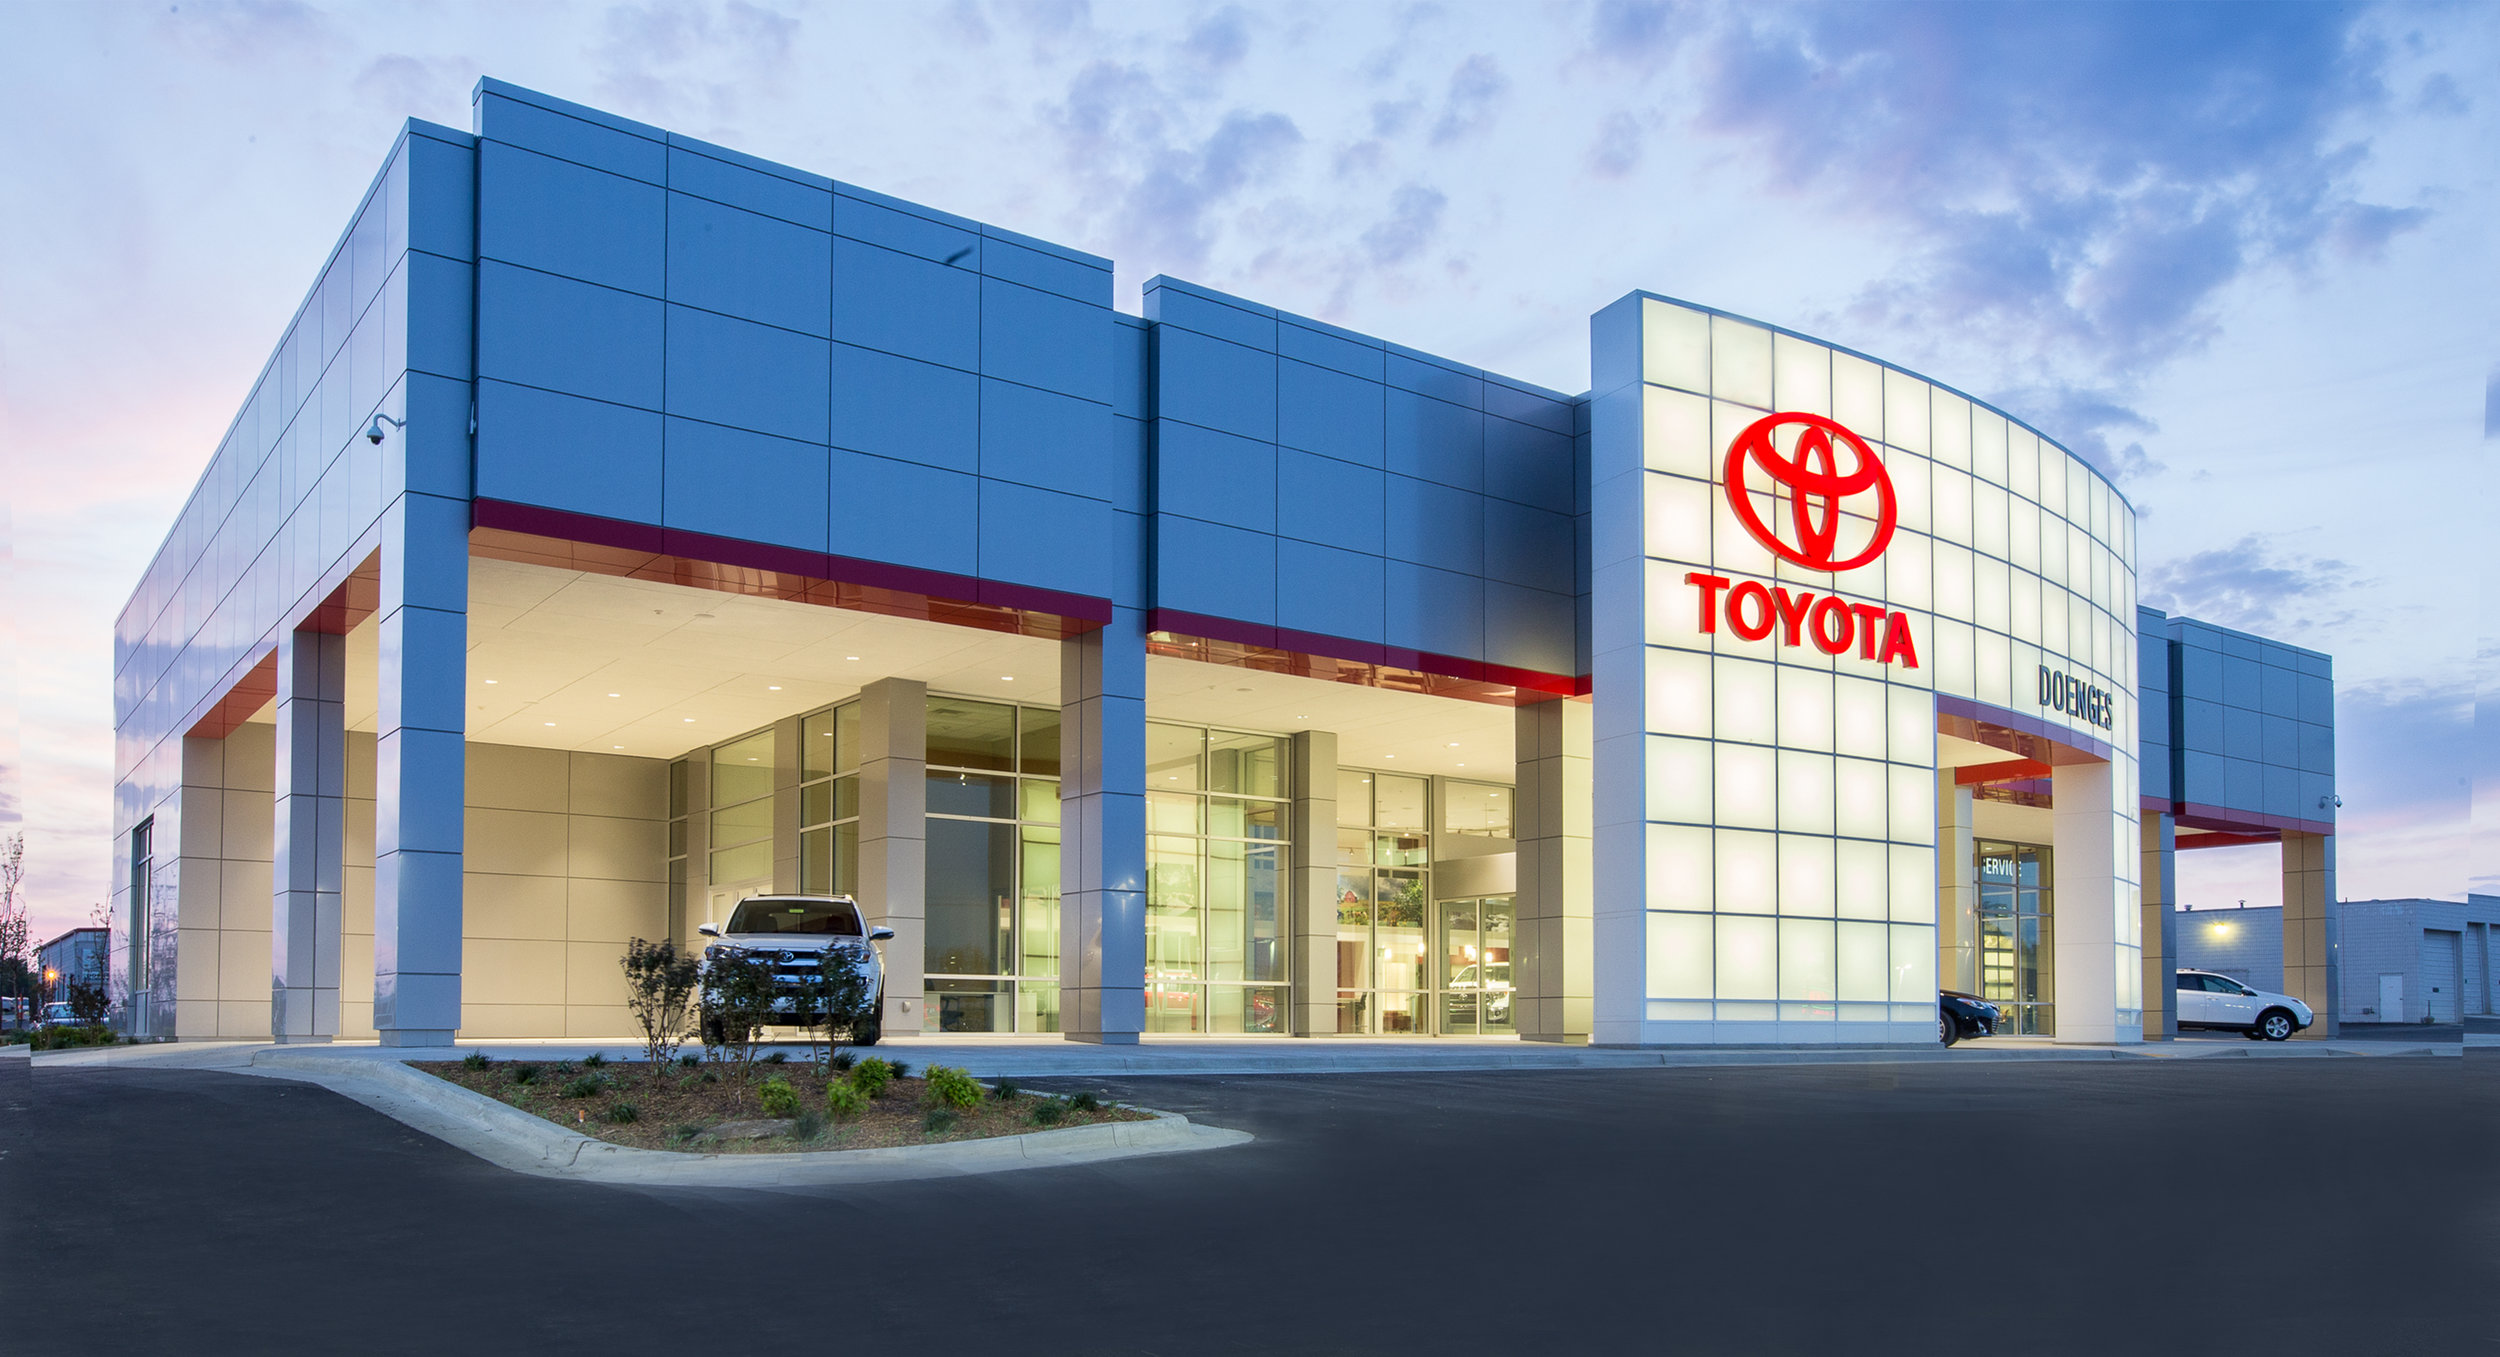 Doenges Toyota